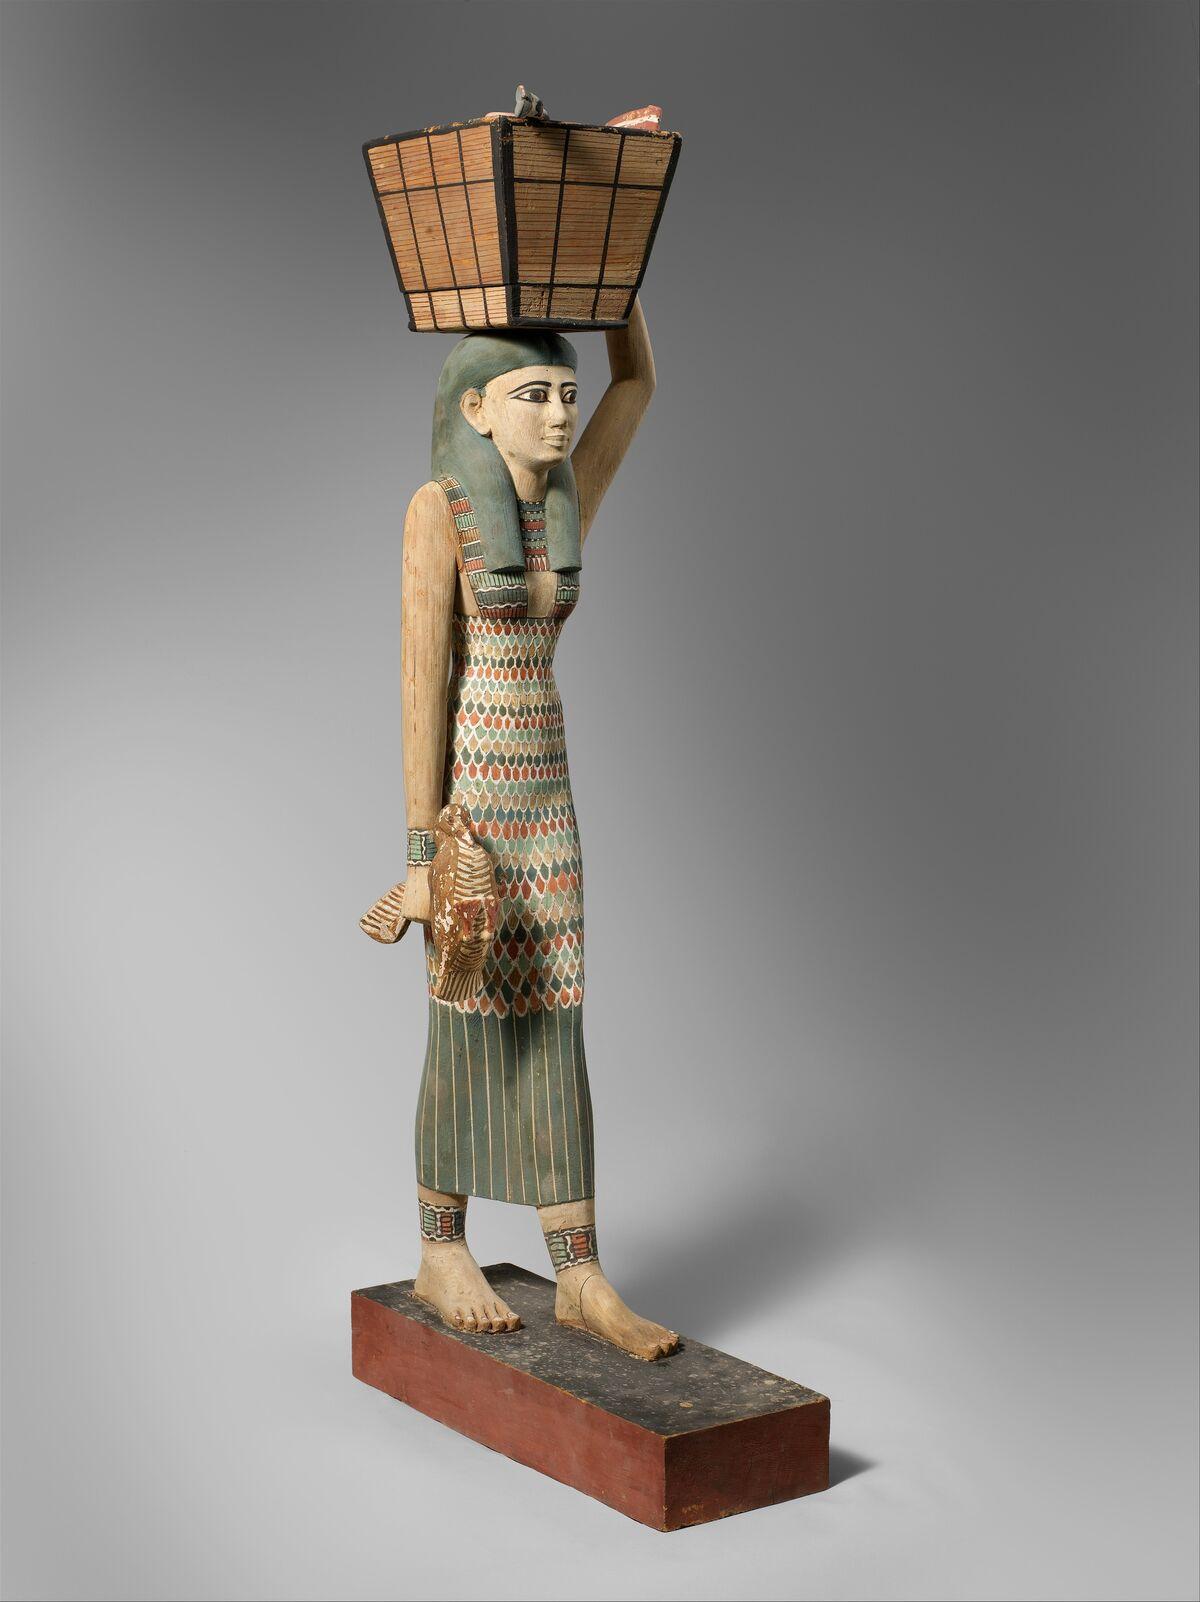 Unknown, Estate Figure, 1981–1975 B.C.. Courtesy of The Metropolitan Museum of Art.